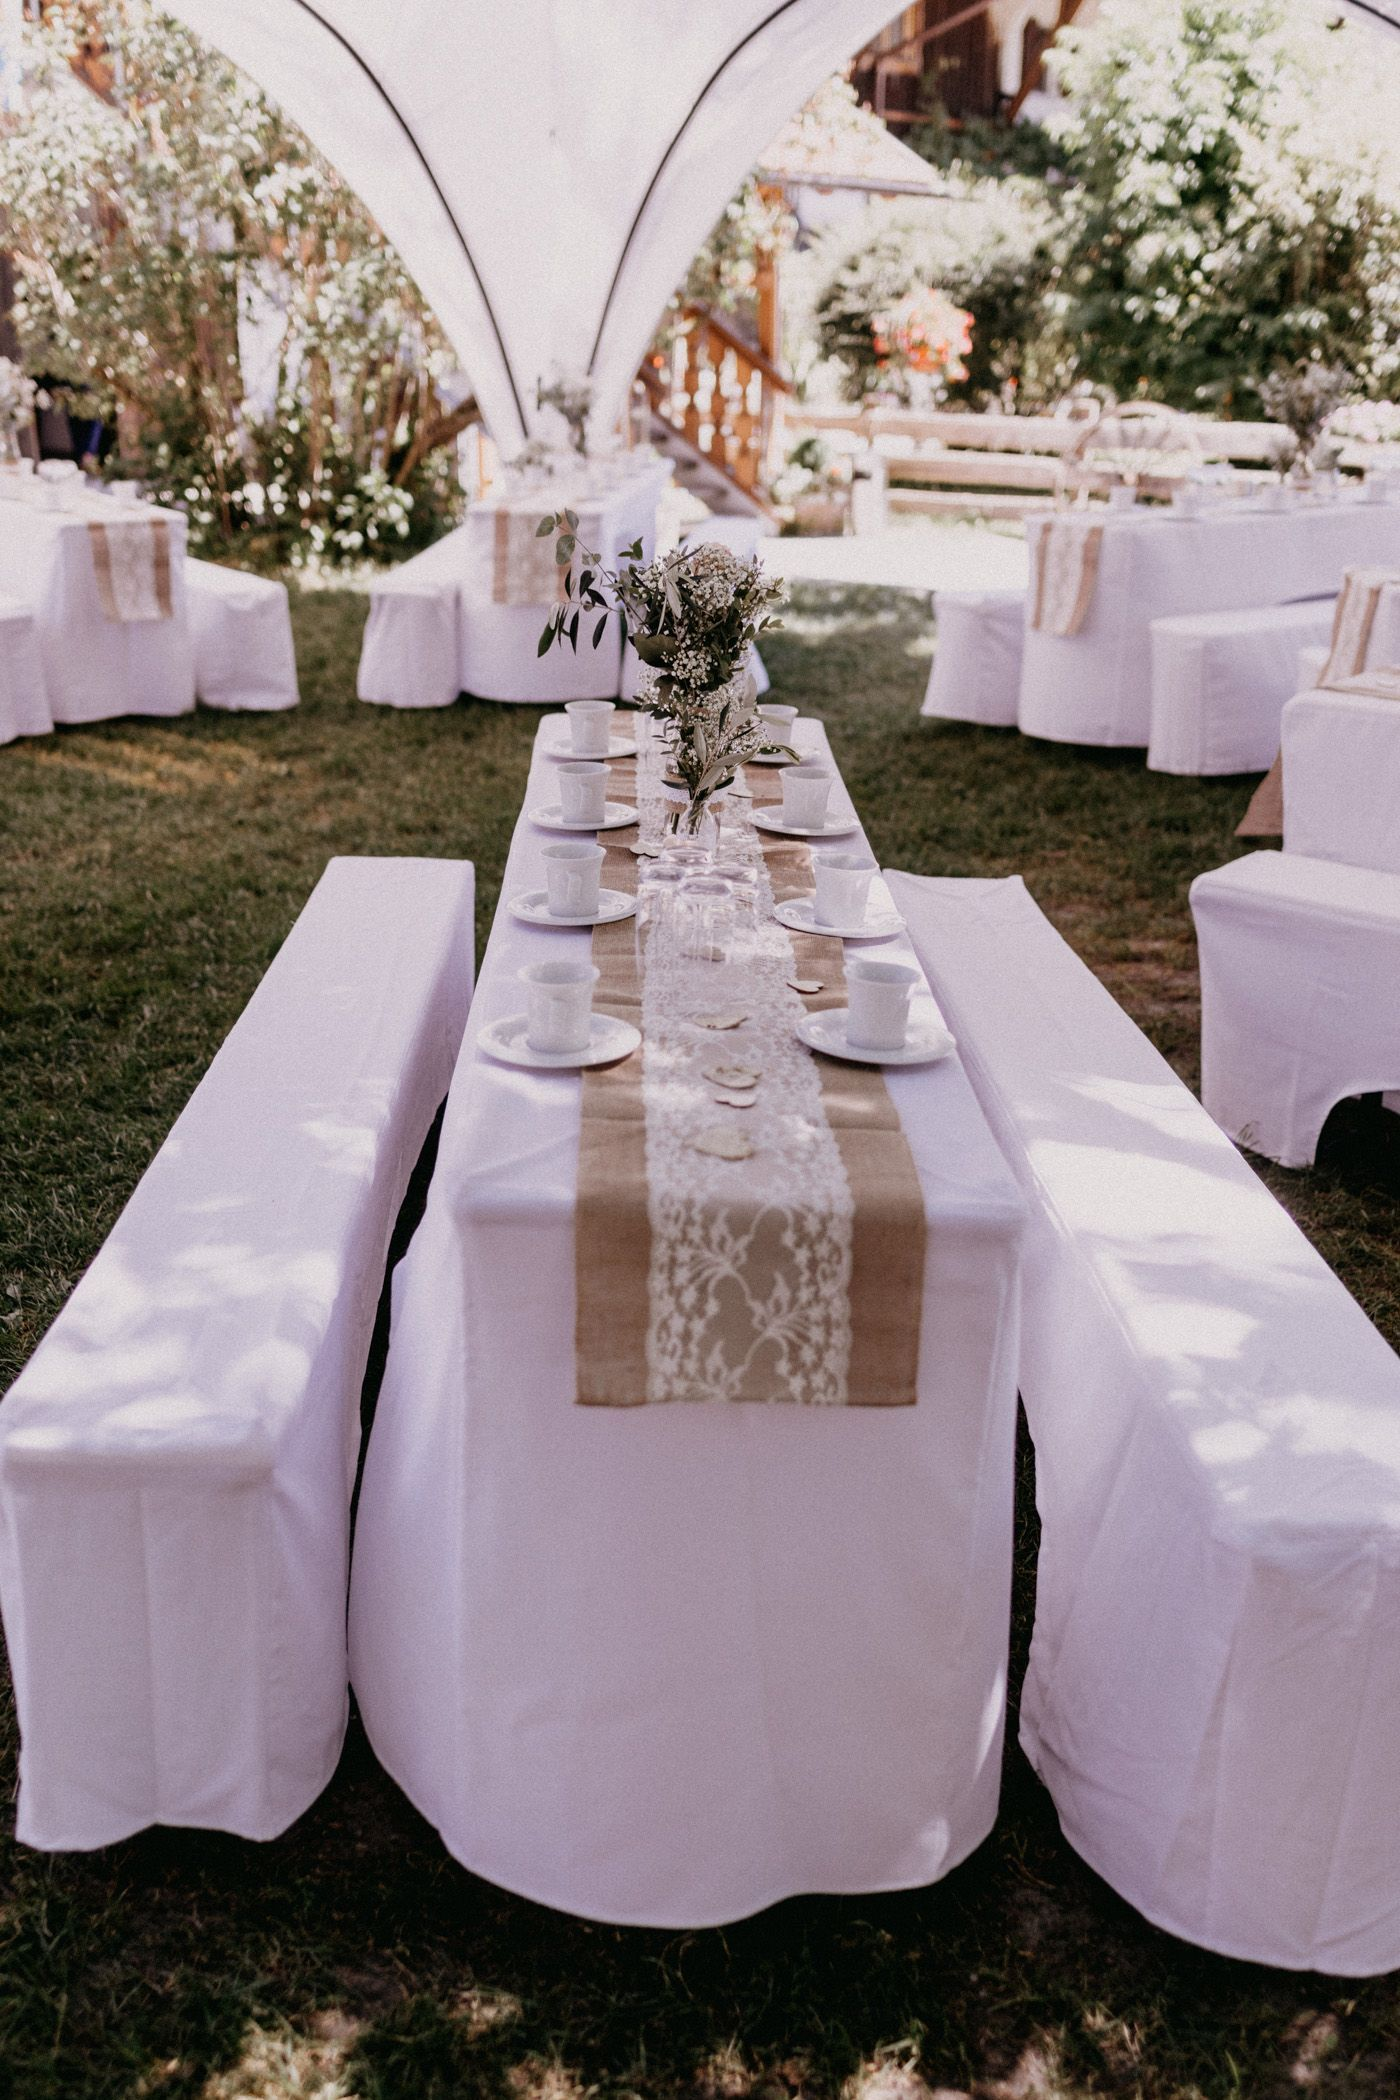 Heiraten In Karnten Mieten Party Vasen Tischdeko Zelt Hochzeit Dekoration Mietmobel Stuhle Gartenh Hochzeit Zelt Deko Dekoration Hochzeit Zelt Mieten